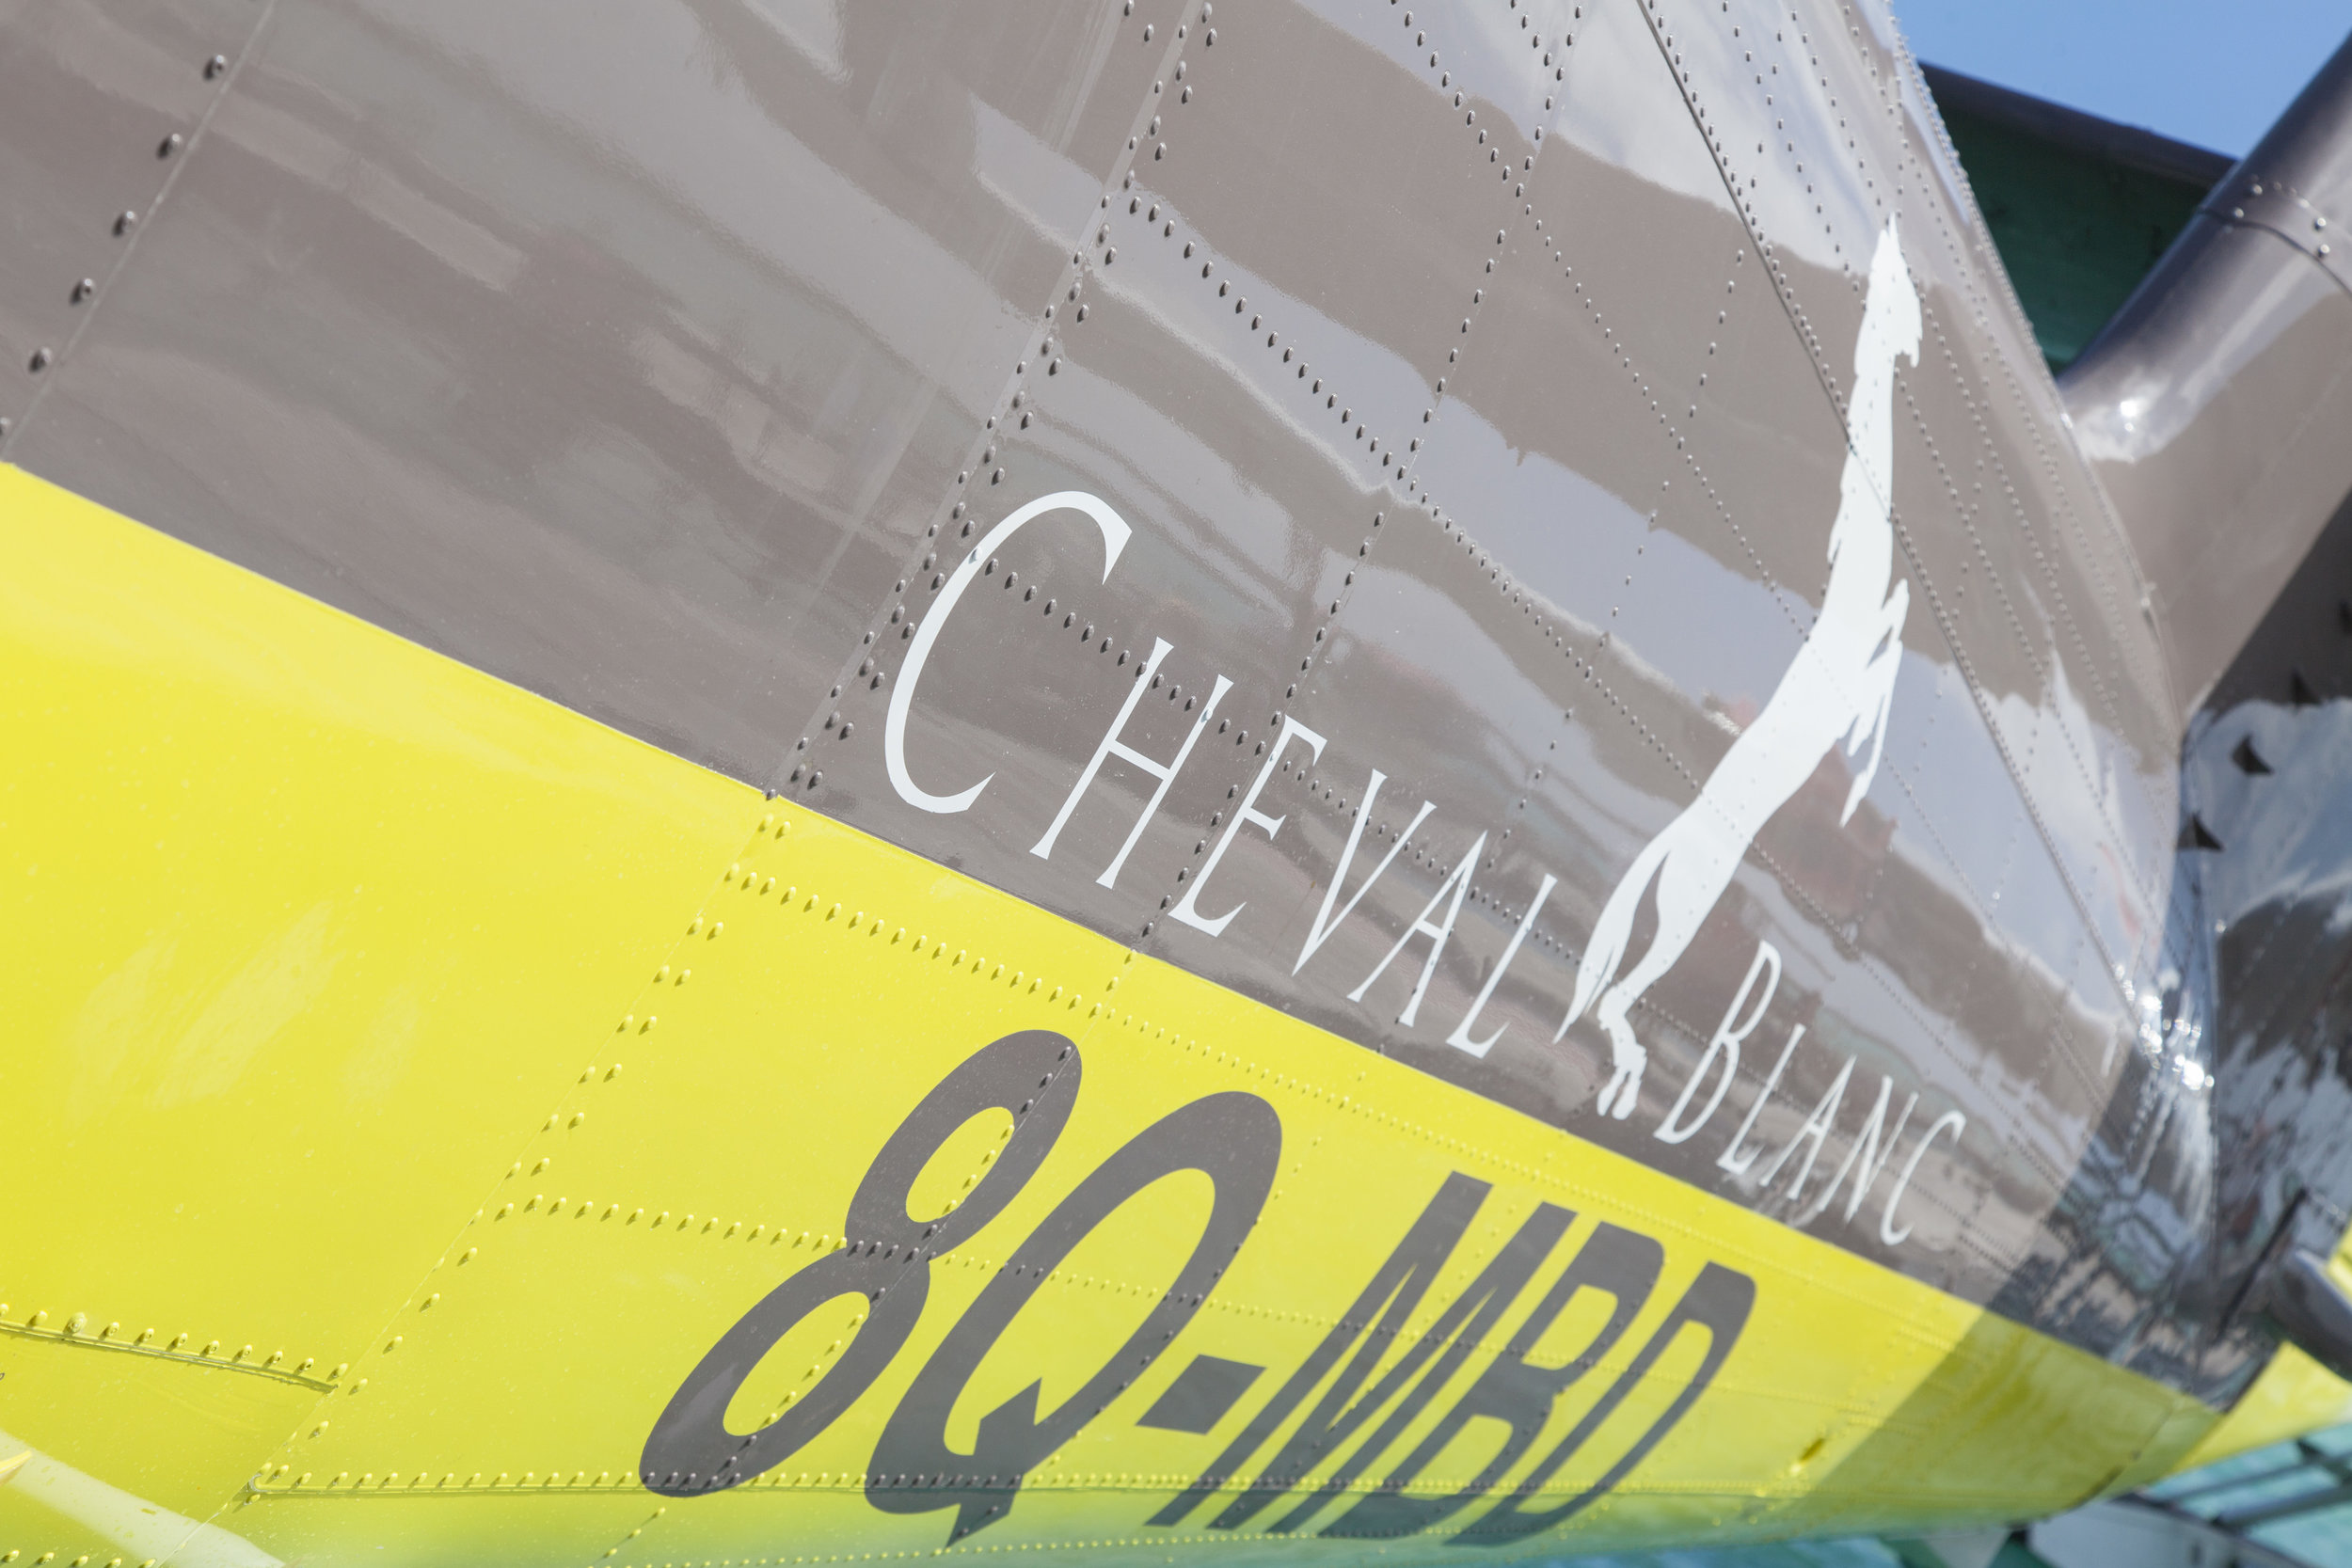 20150831093403_1-3-seaplane-img-1753.jpg